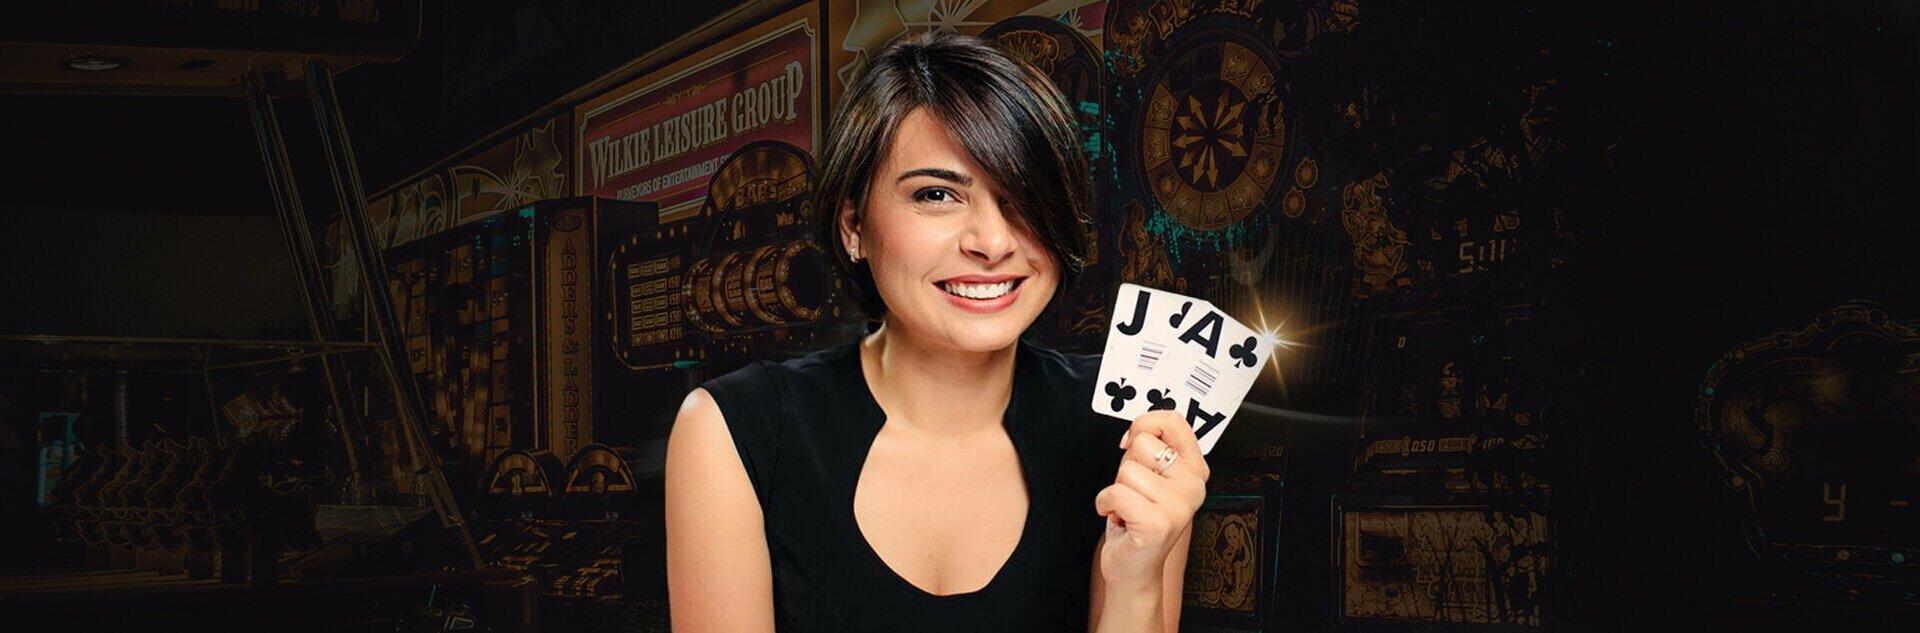 Plush Casino review UK